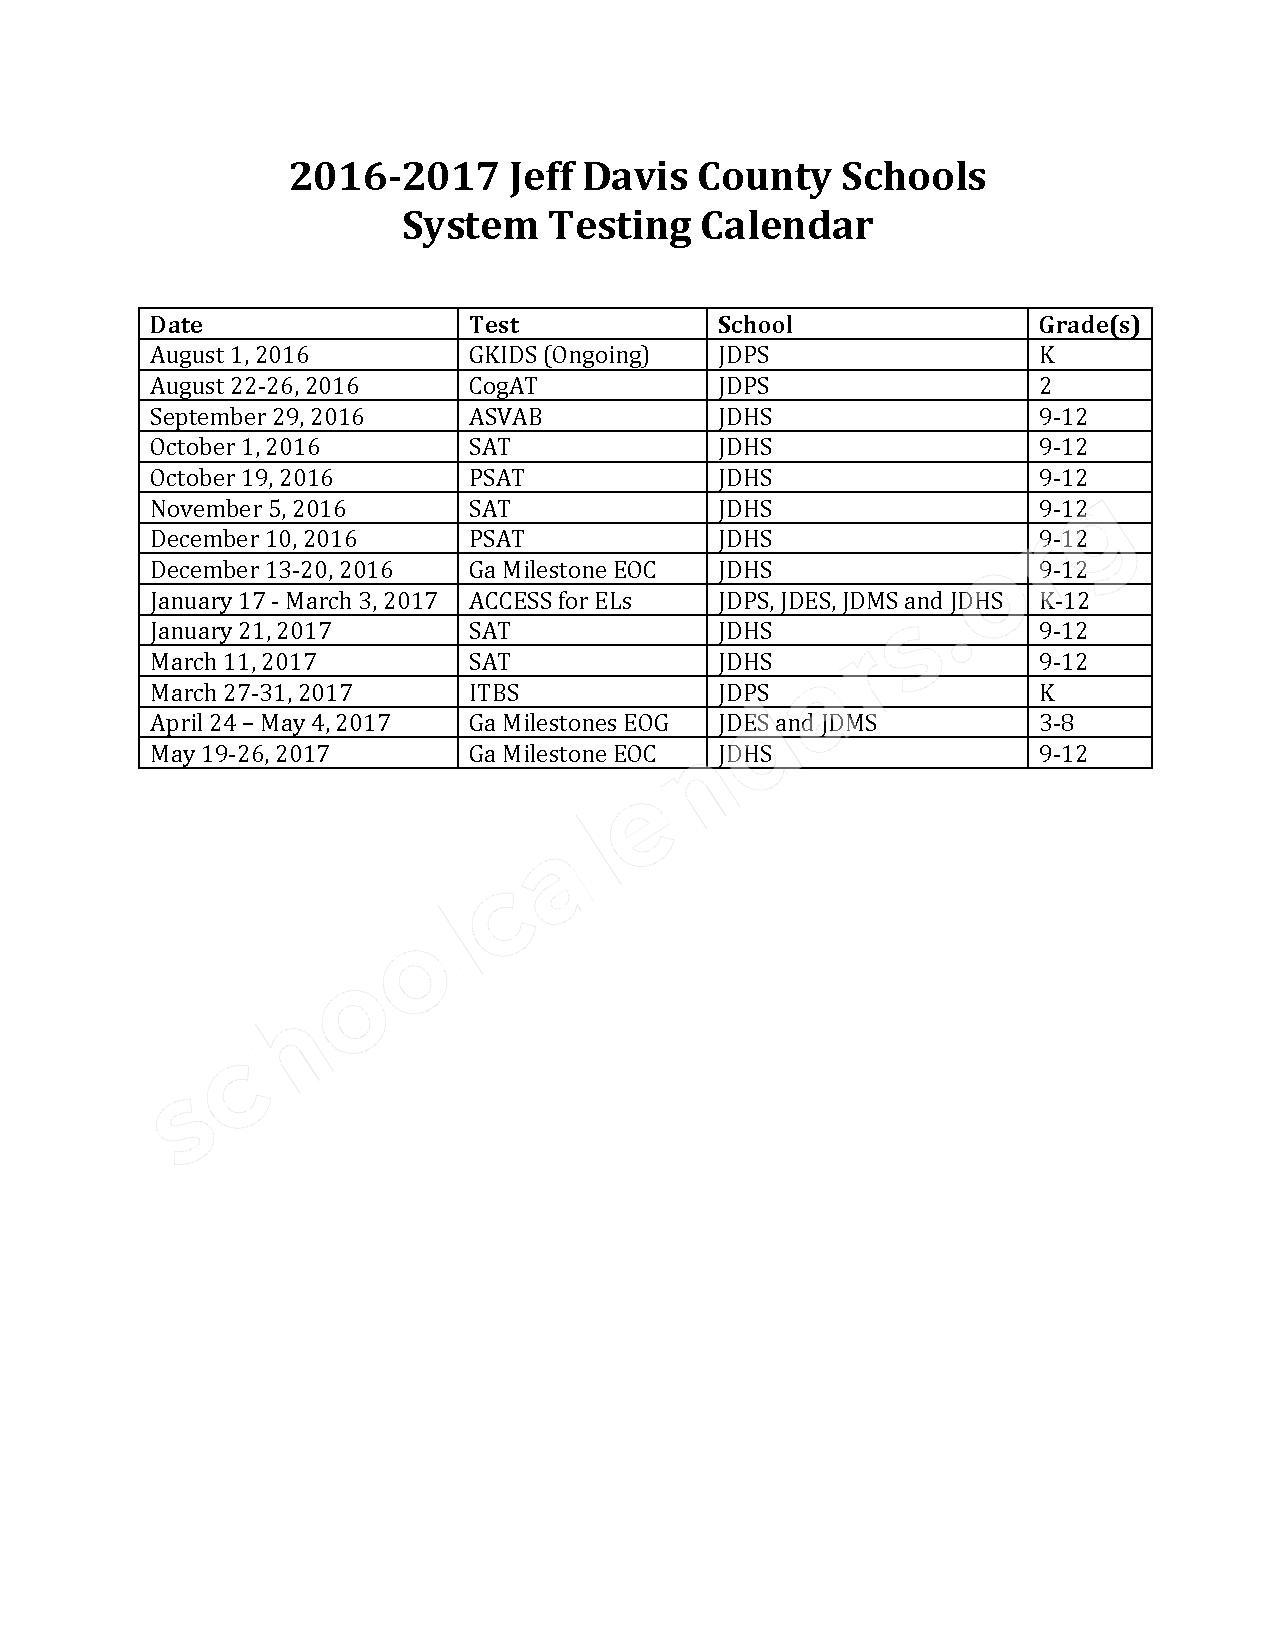 2016 - 2017 Testing Calendar – Jeff Davis County School District – page 1